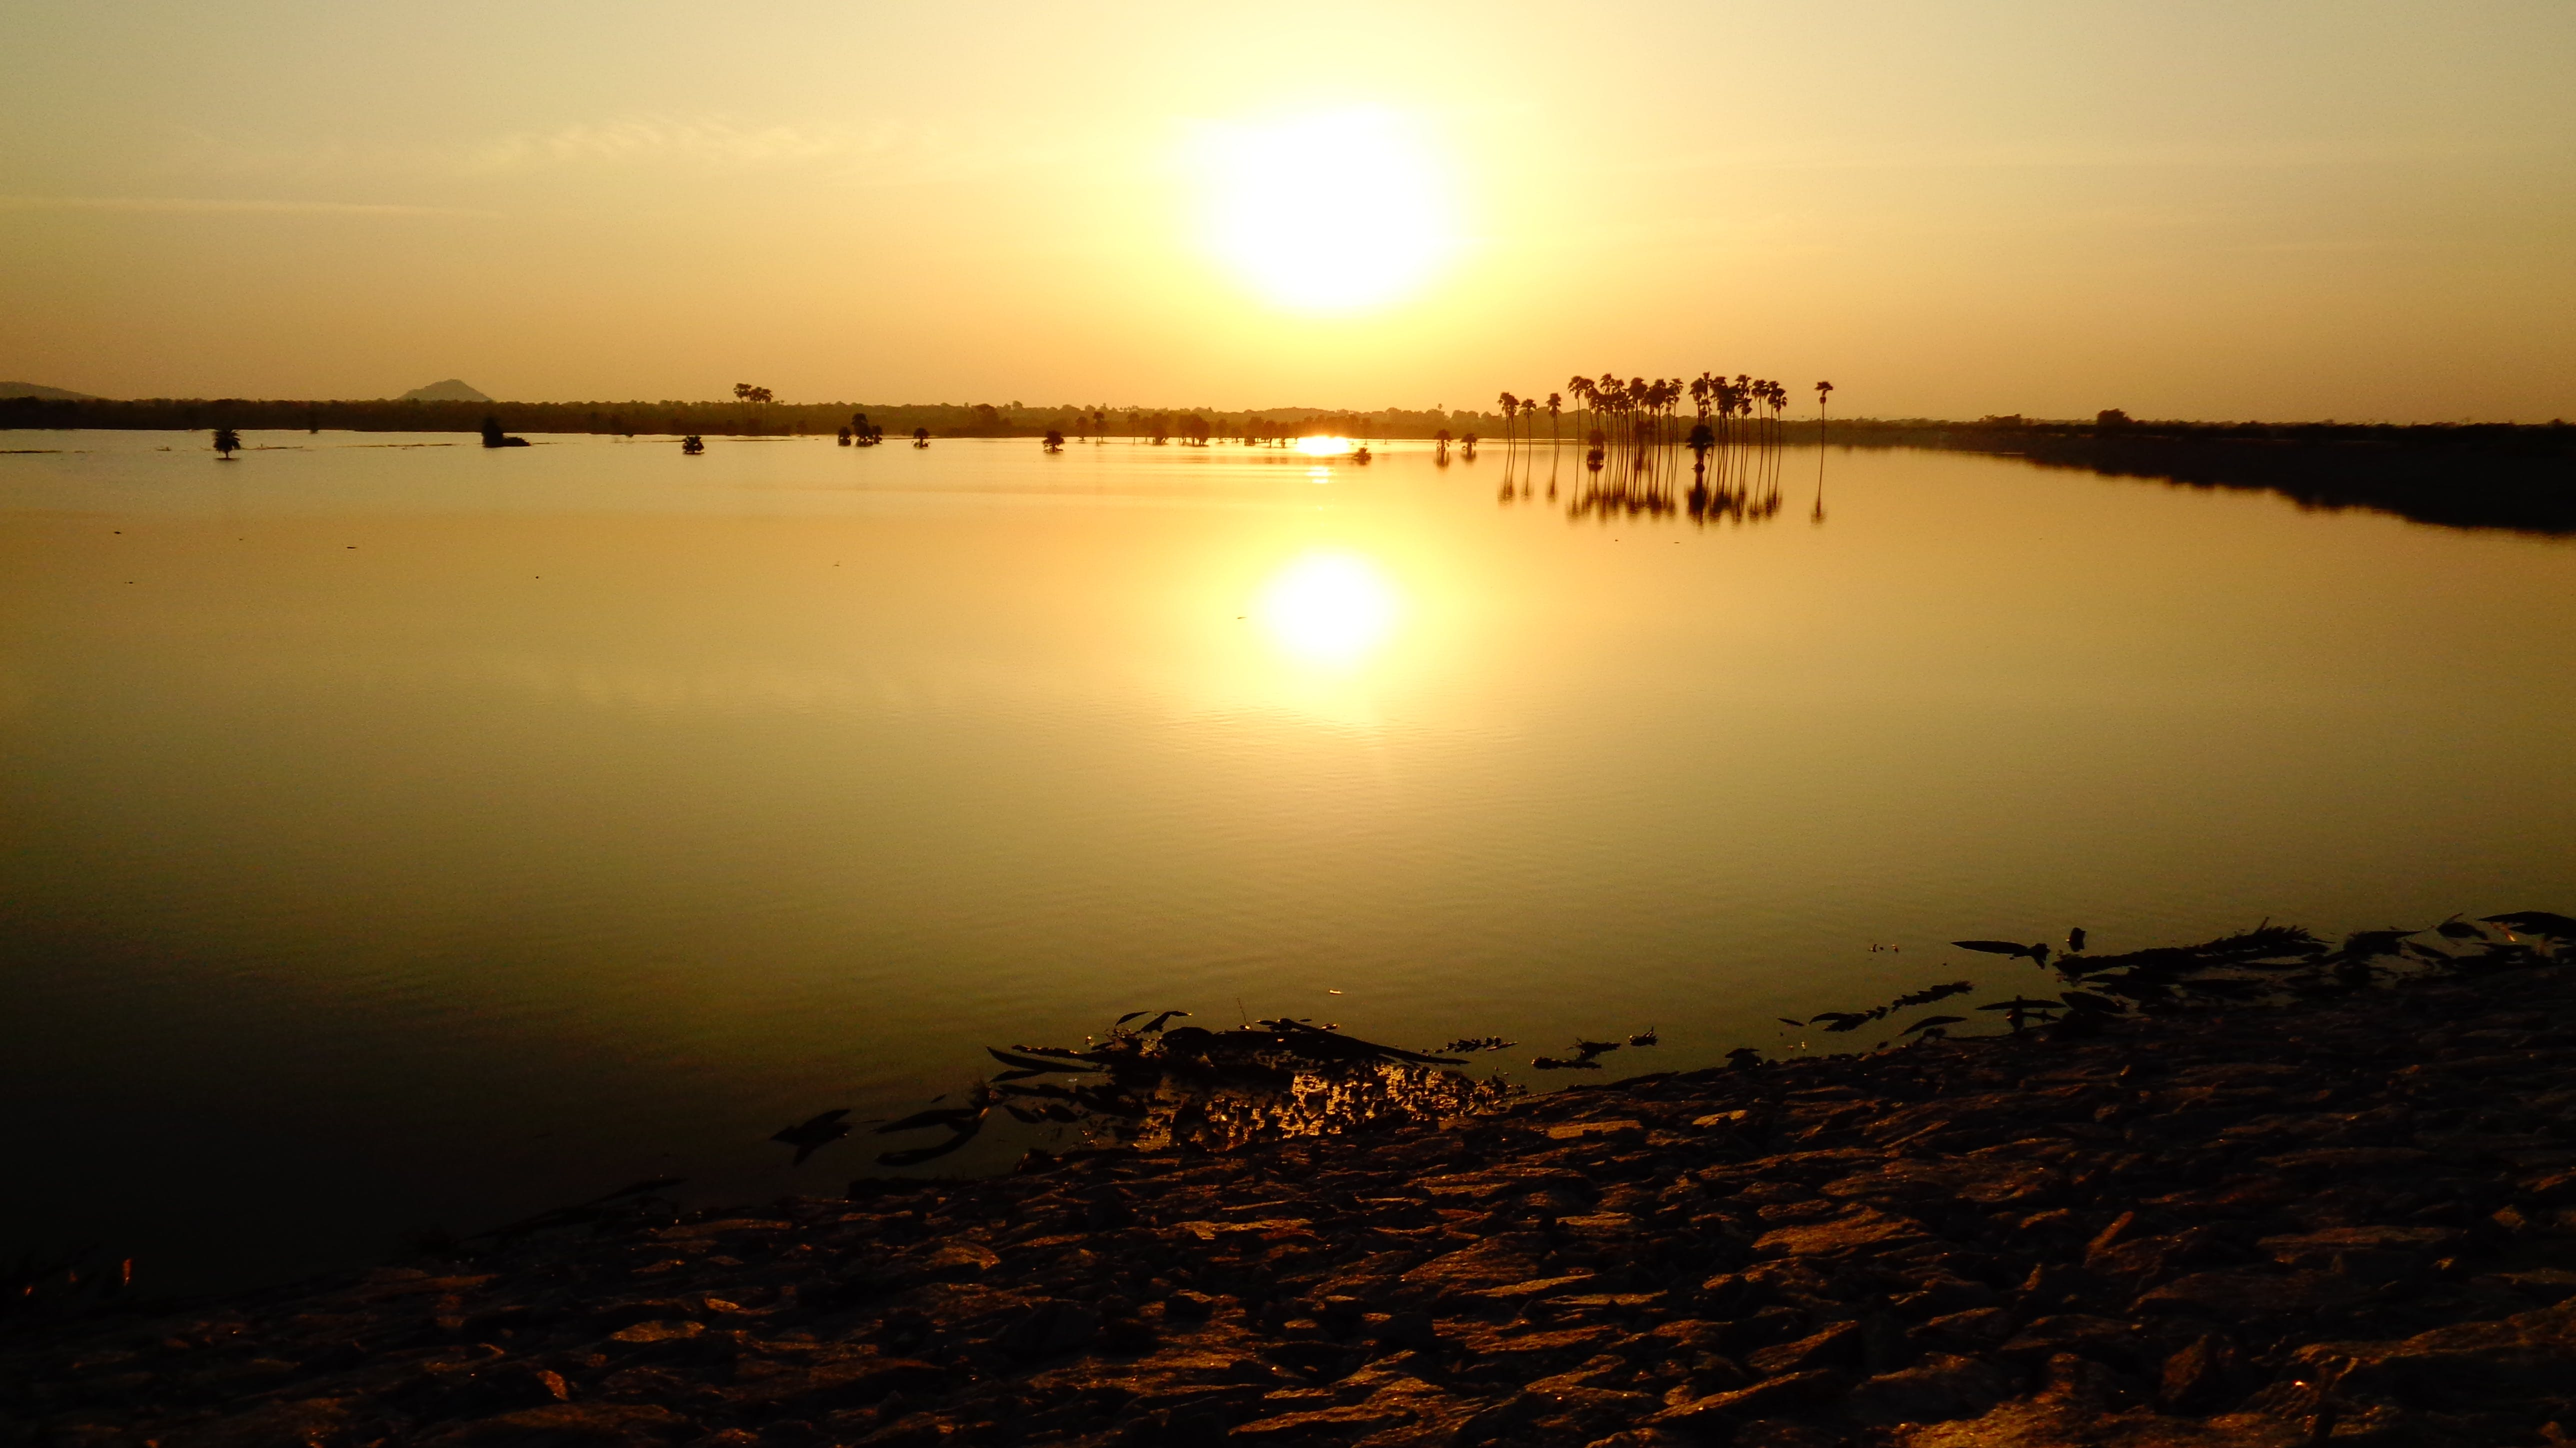 Free stock photo of lakeside view sunset